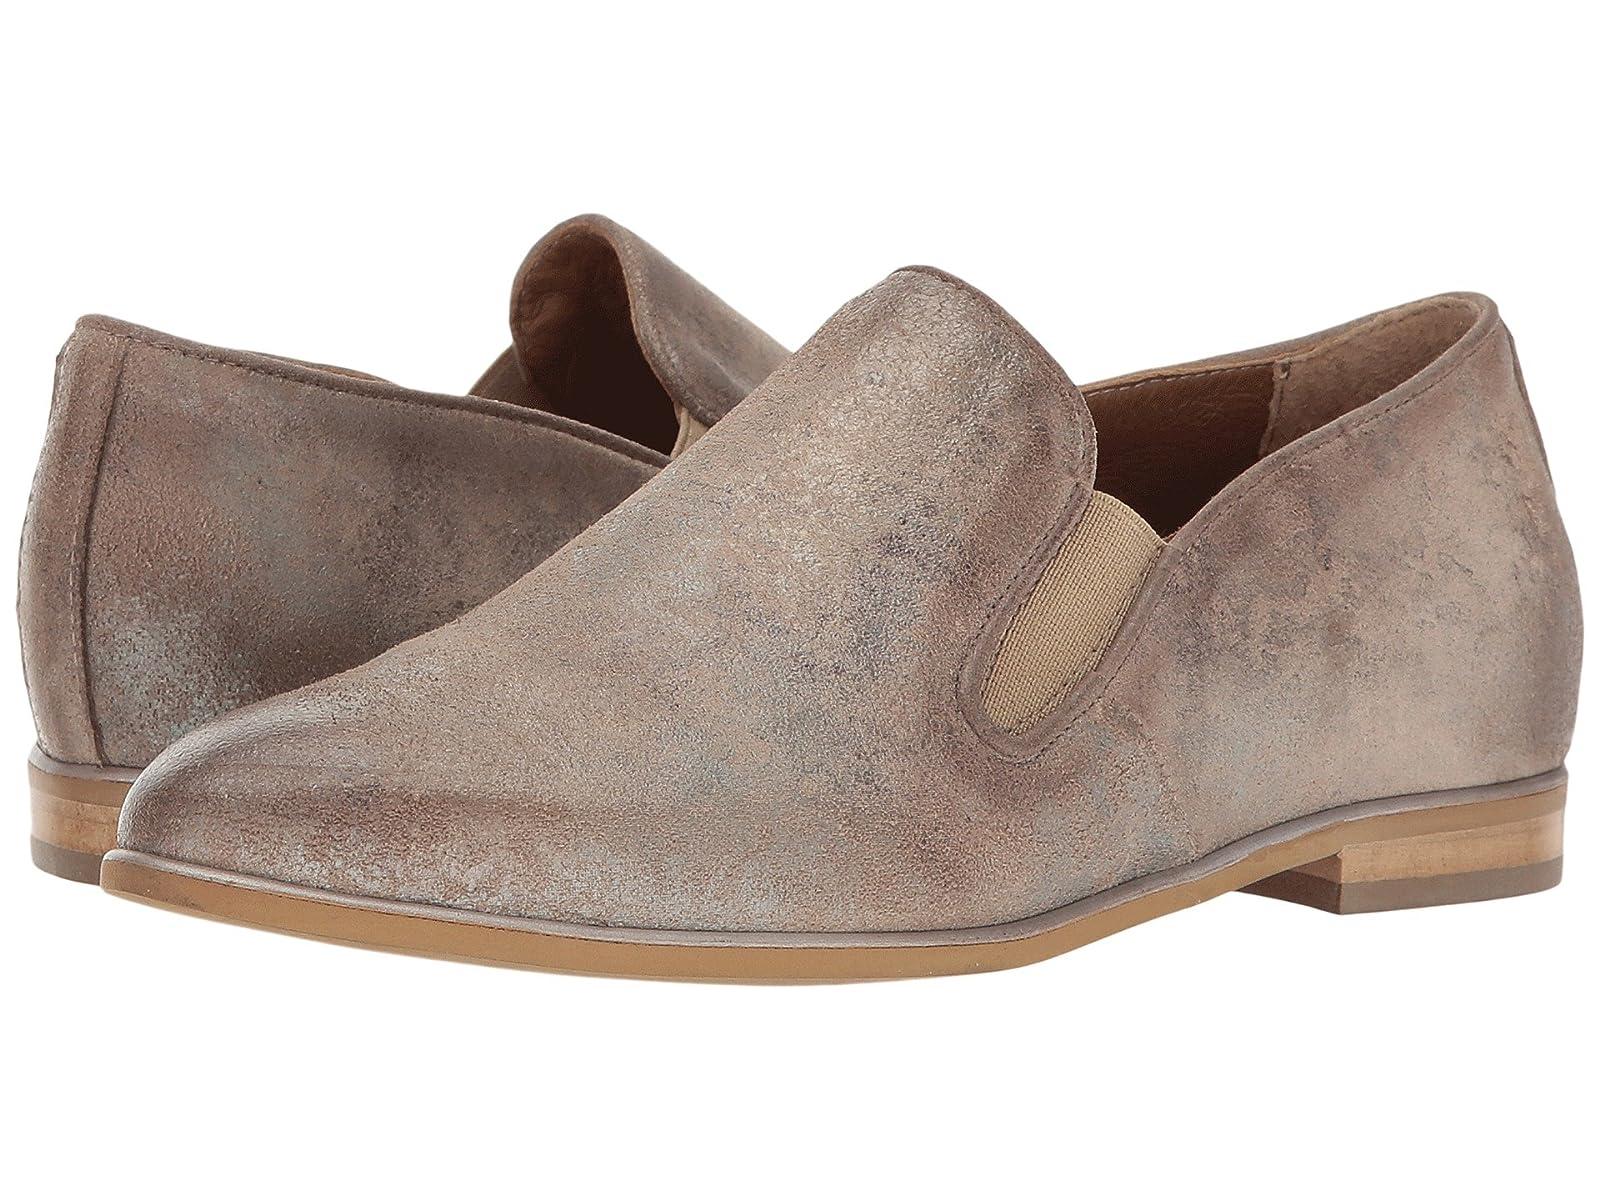 Miz Mooz FritzCheap and distinctive eye-catching shoes